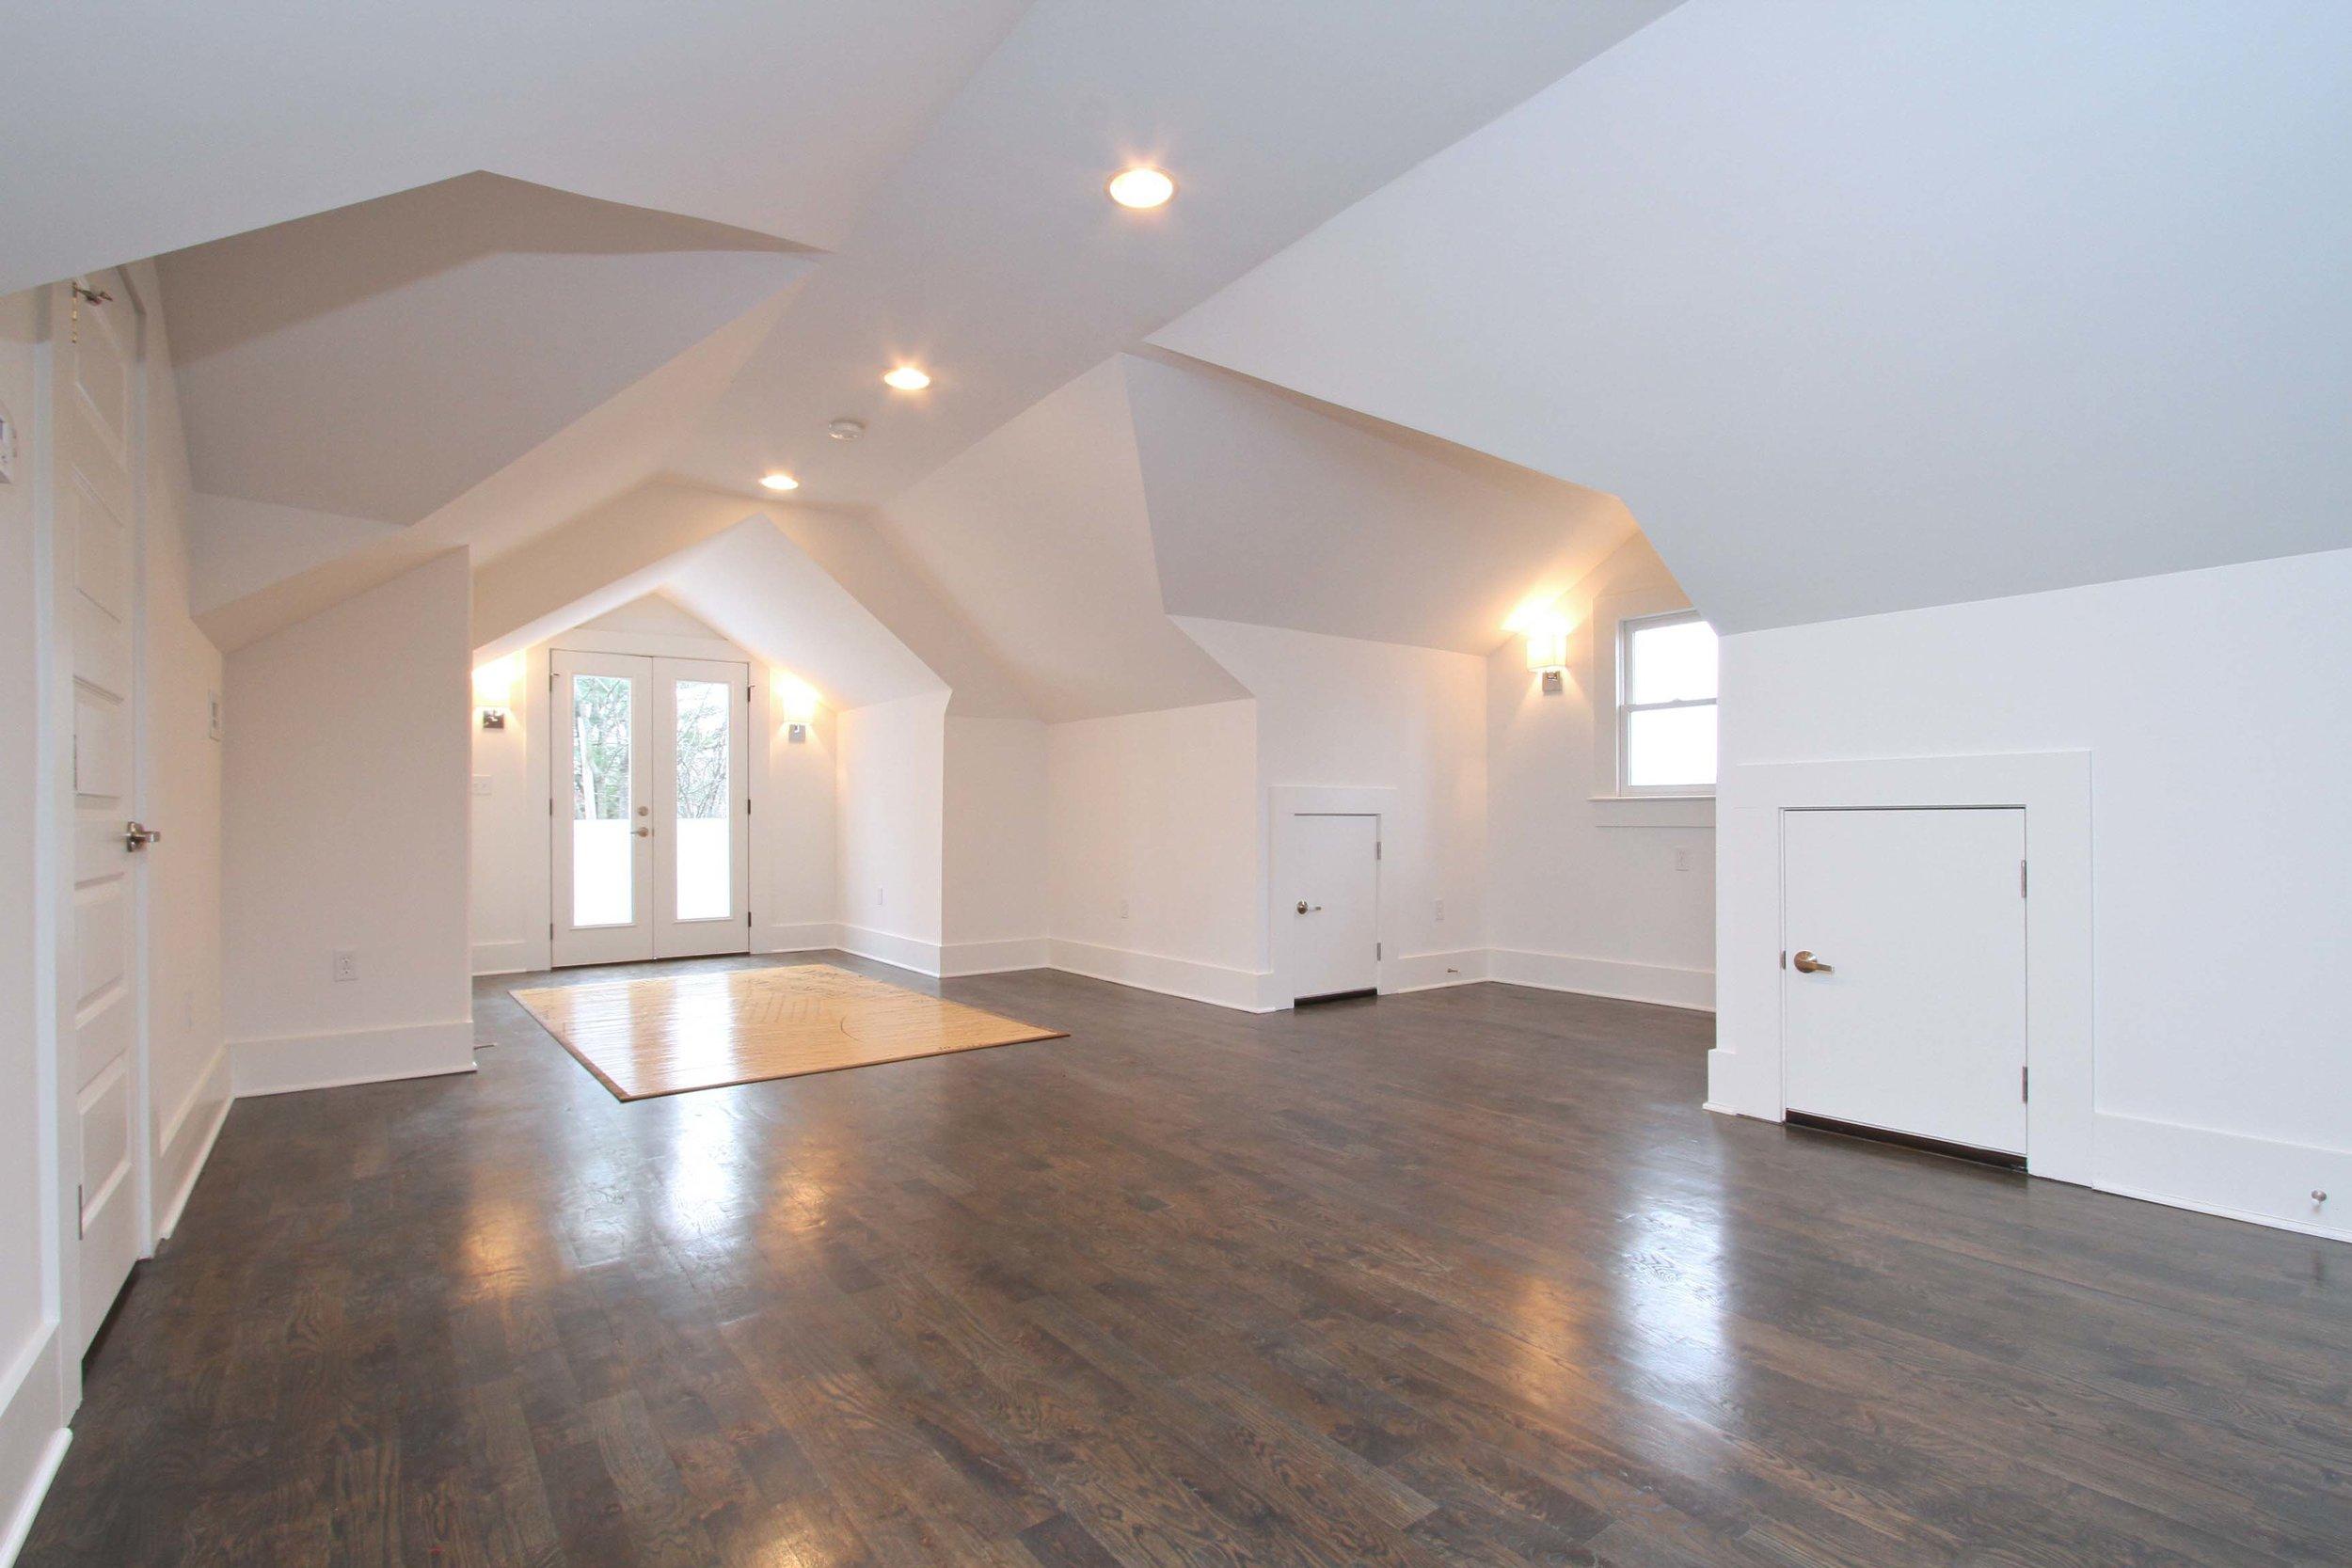 House-Plans-Online-Craftsman-Nashville-Peggy-Newman-Benton-Bonus-Storage.jpg